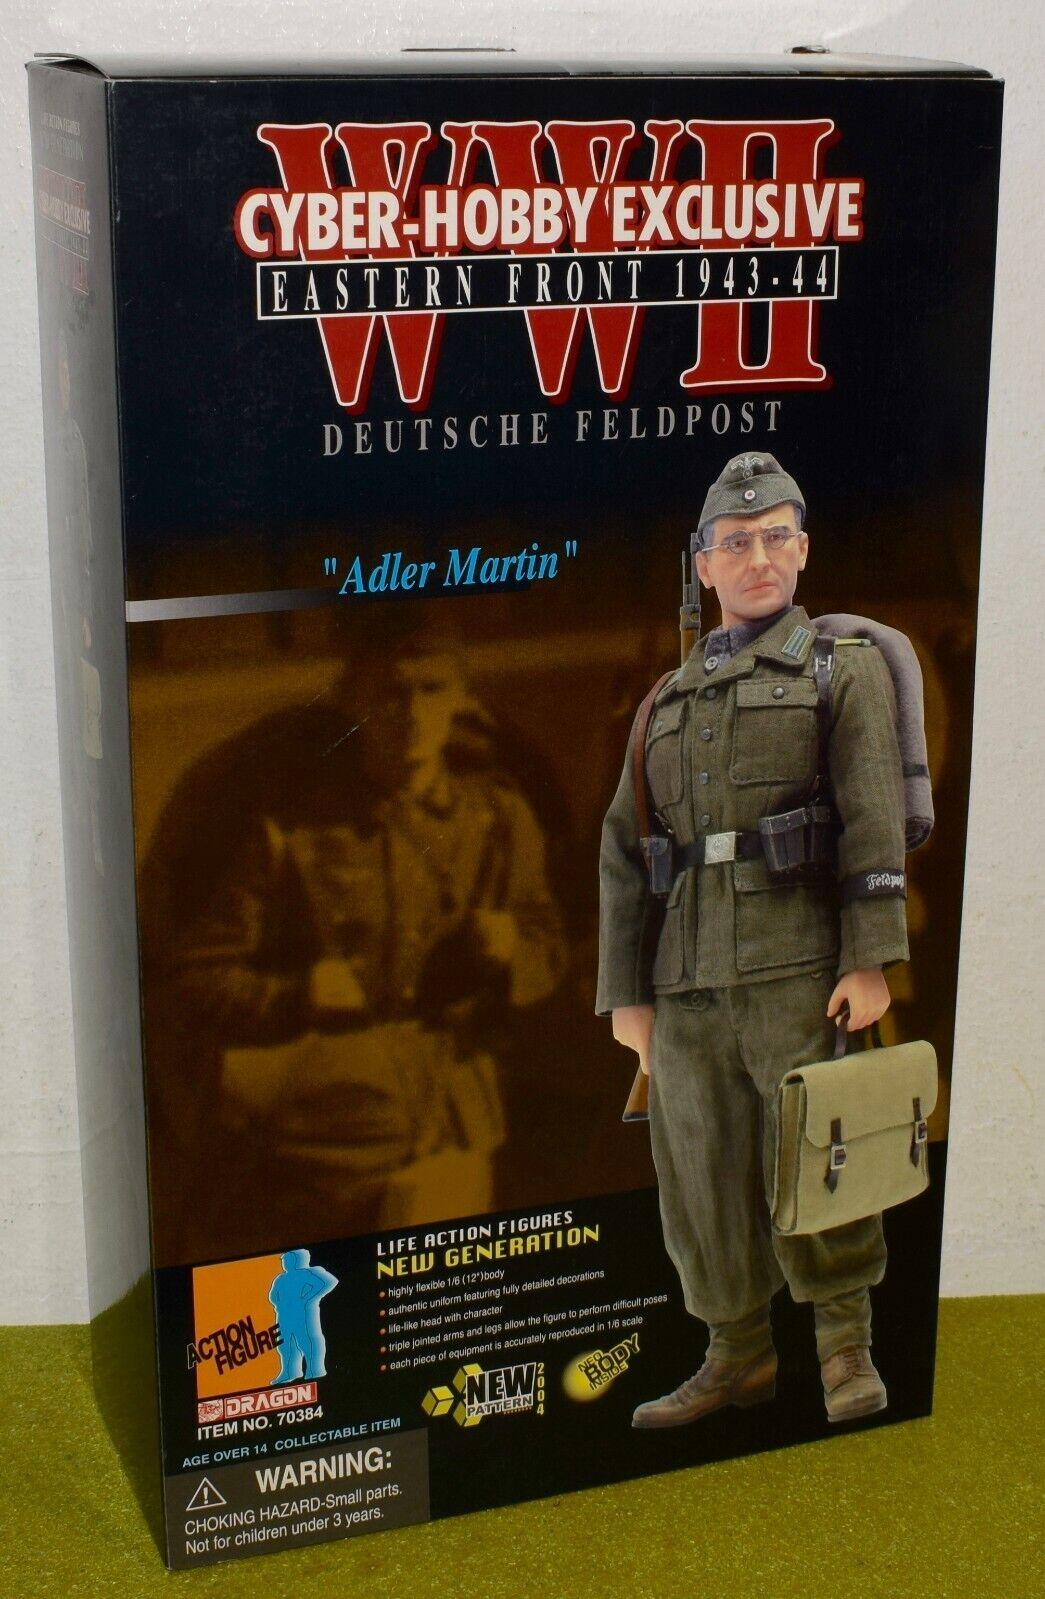 DRAGON 1 6 SCALE WW II GERMAN ADLER MARTIN DEUTSCHE FELDPOST CYBER-HOBBY NO CARD